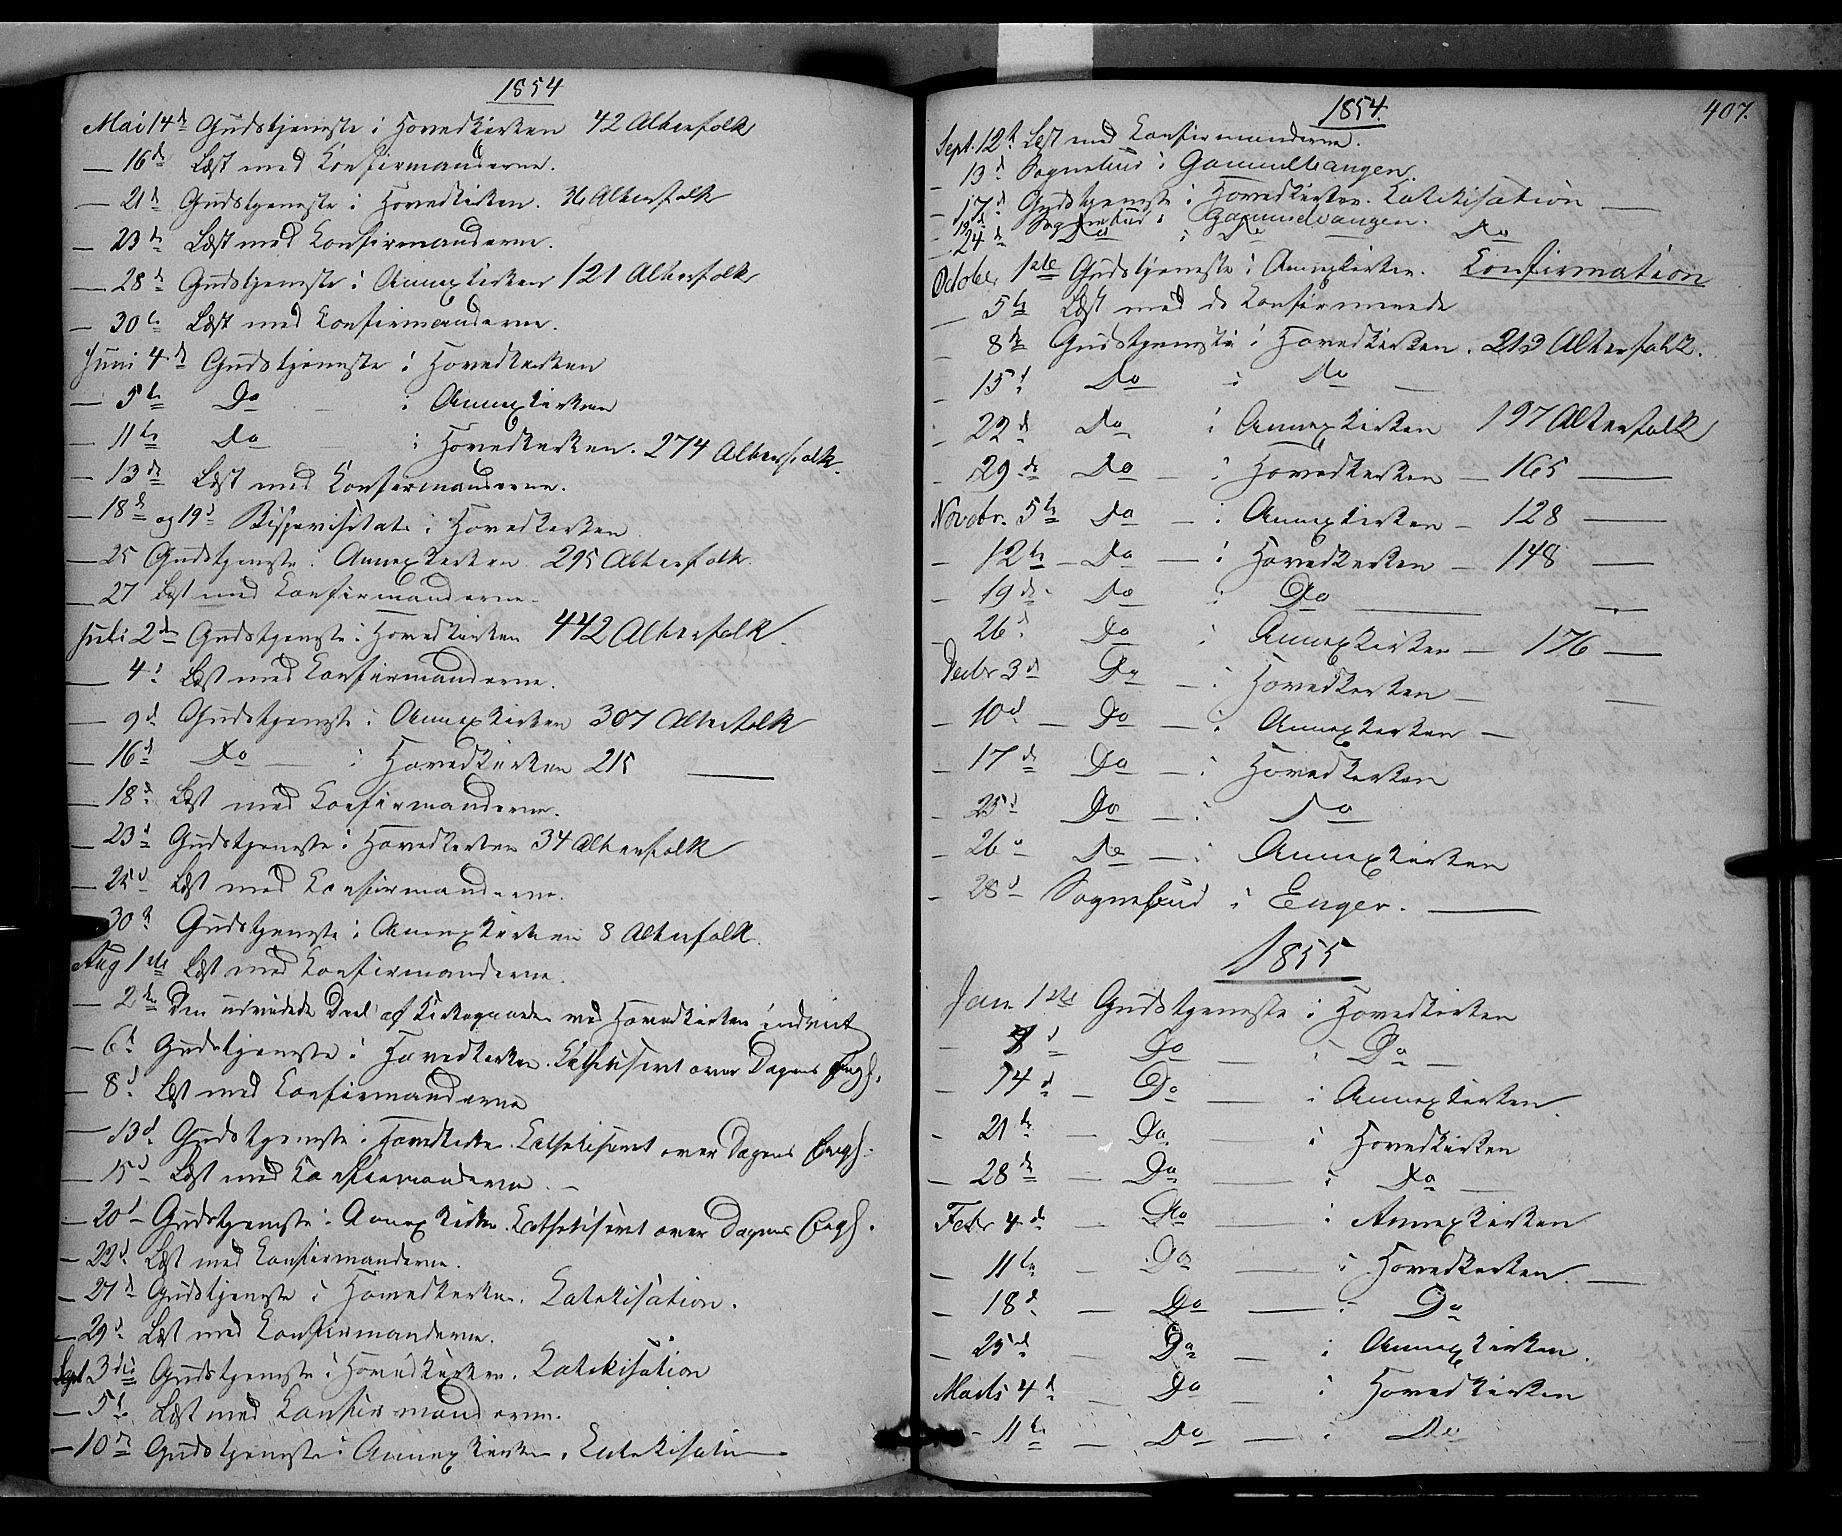 SAH, Vardal prestekontor, H/Ha/Haa/L0006: Ministerialbok nr. 6, 1854-1866, s. 407